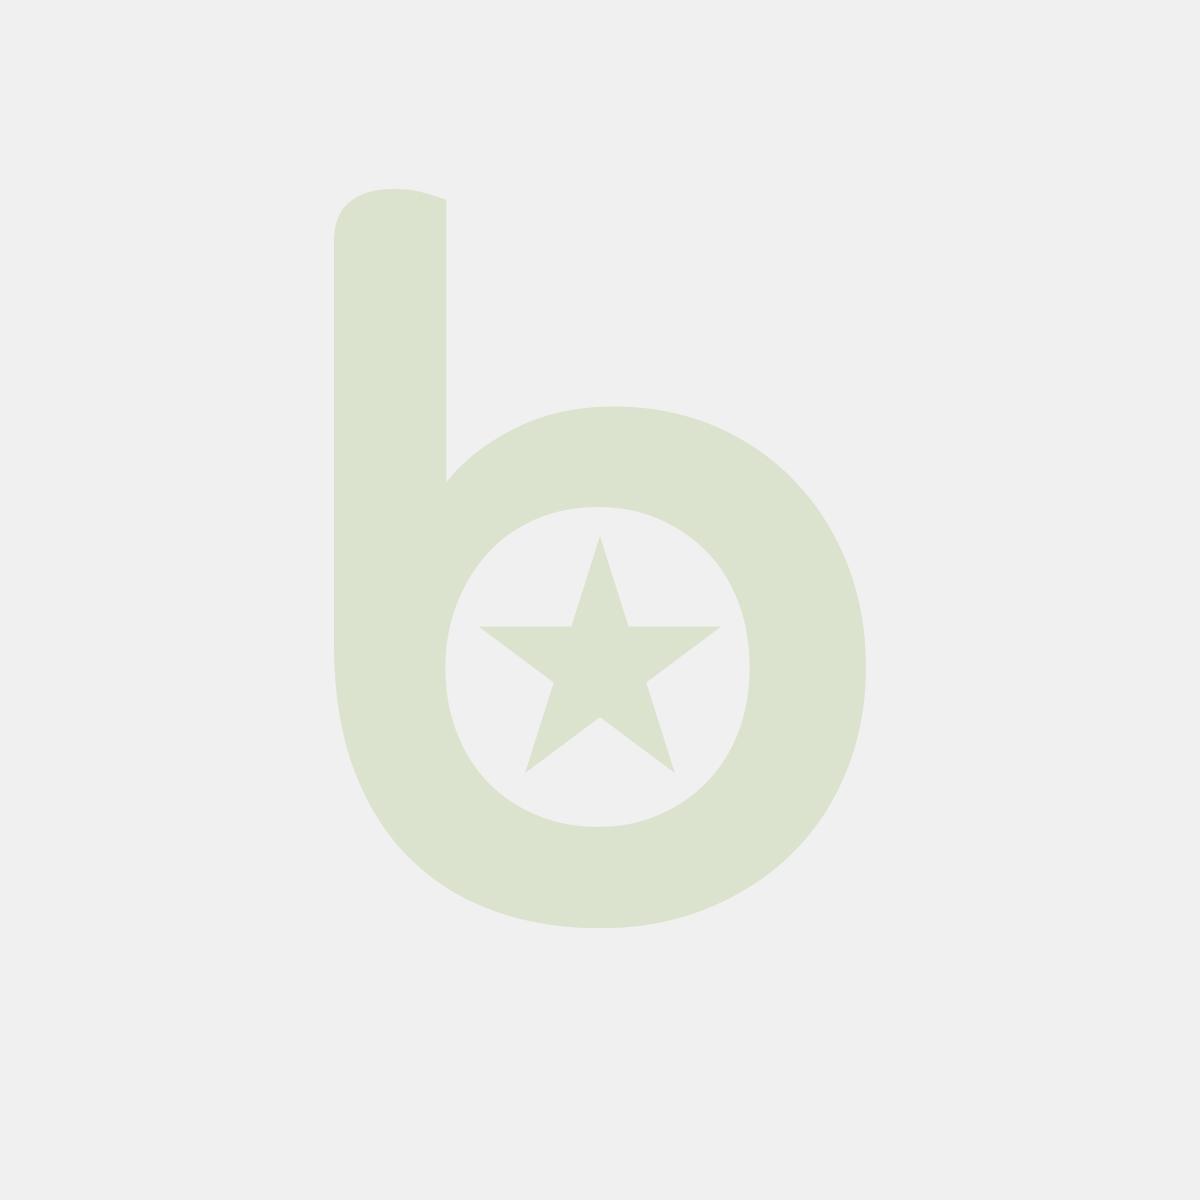 FINGERFOOD - patyczki 10cm KNOT czarne op. 100 sztuk